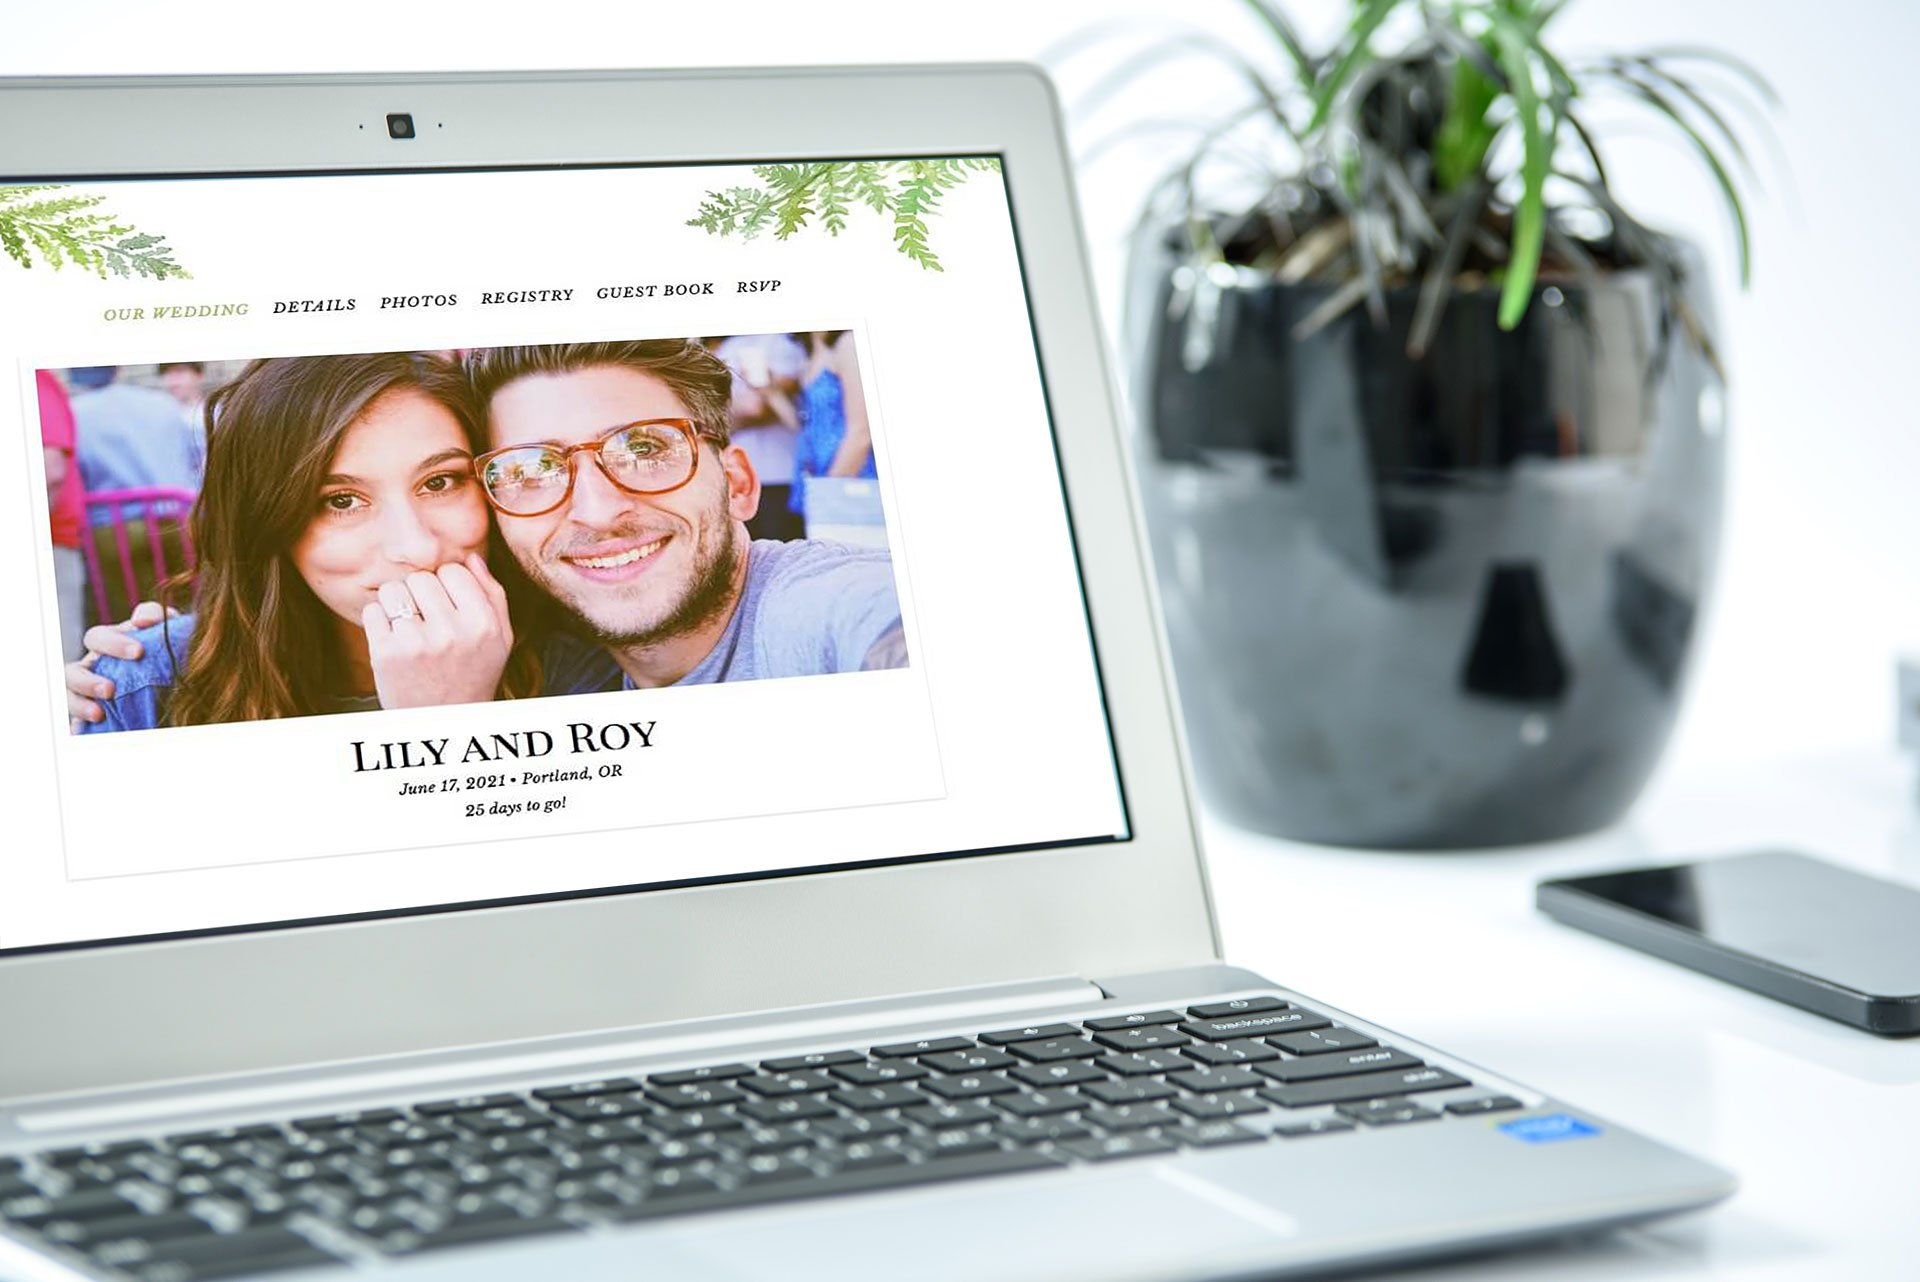 How to Build Your Wedding Website